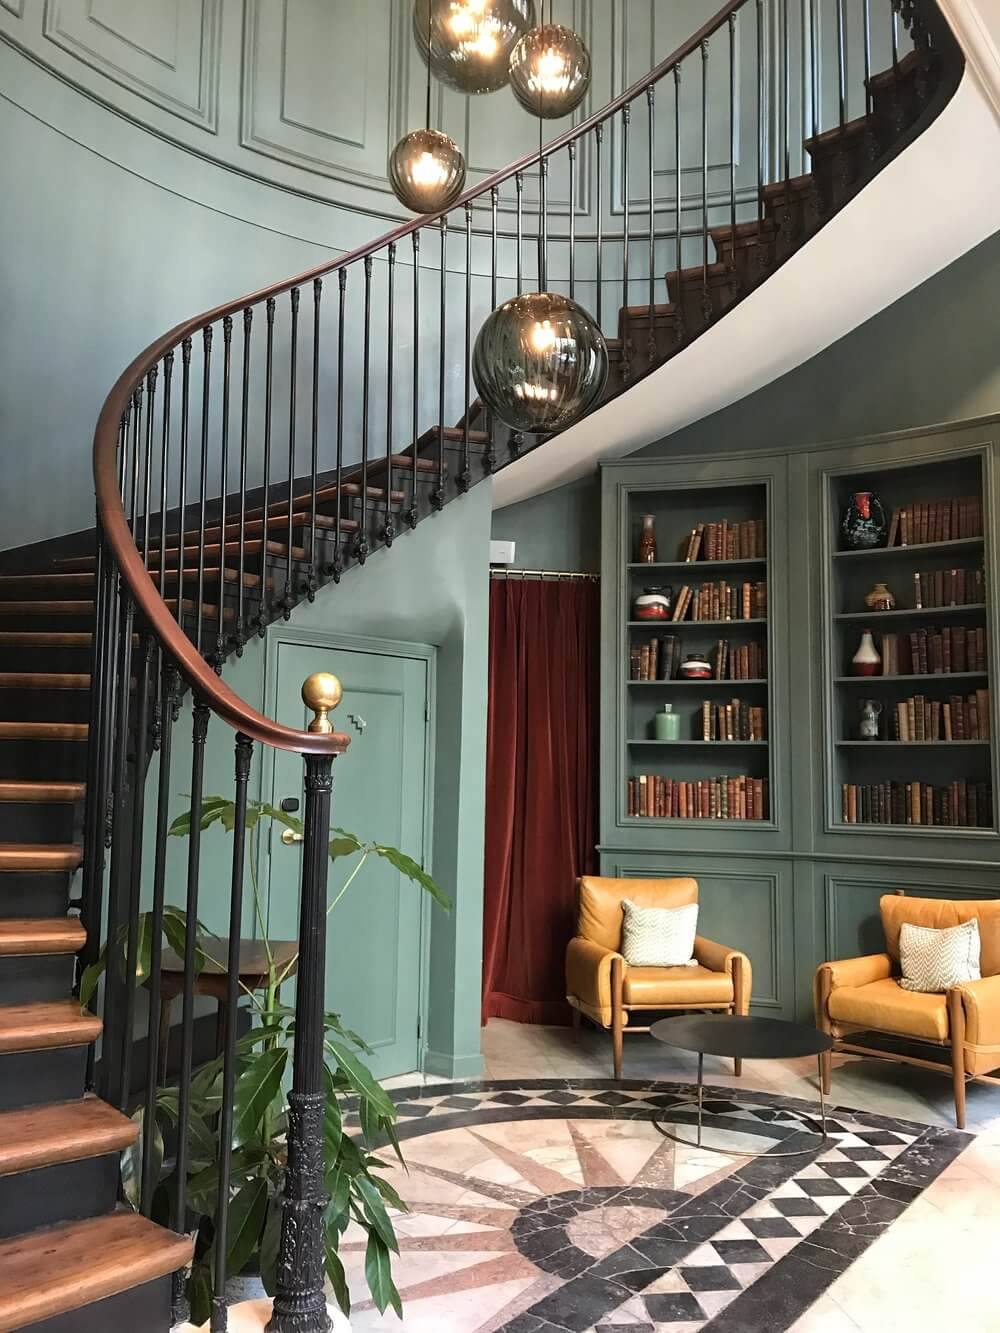 Hoxton Hotel Paris Review - Lobby Interior